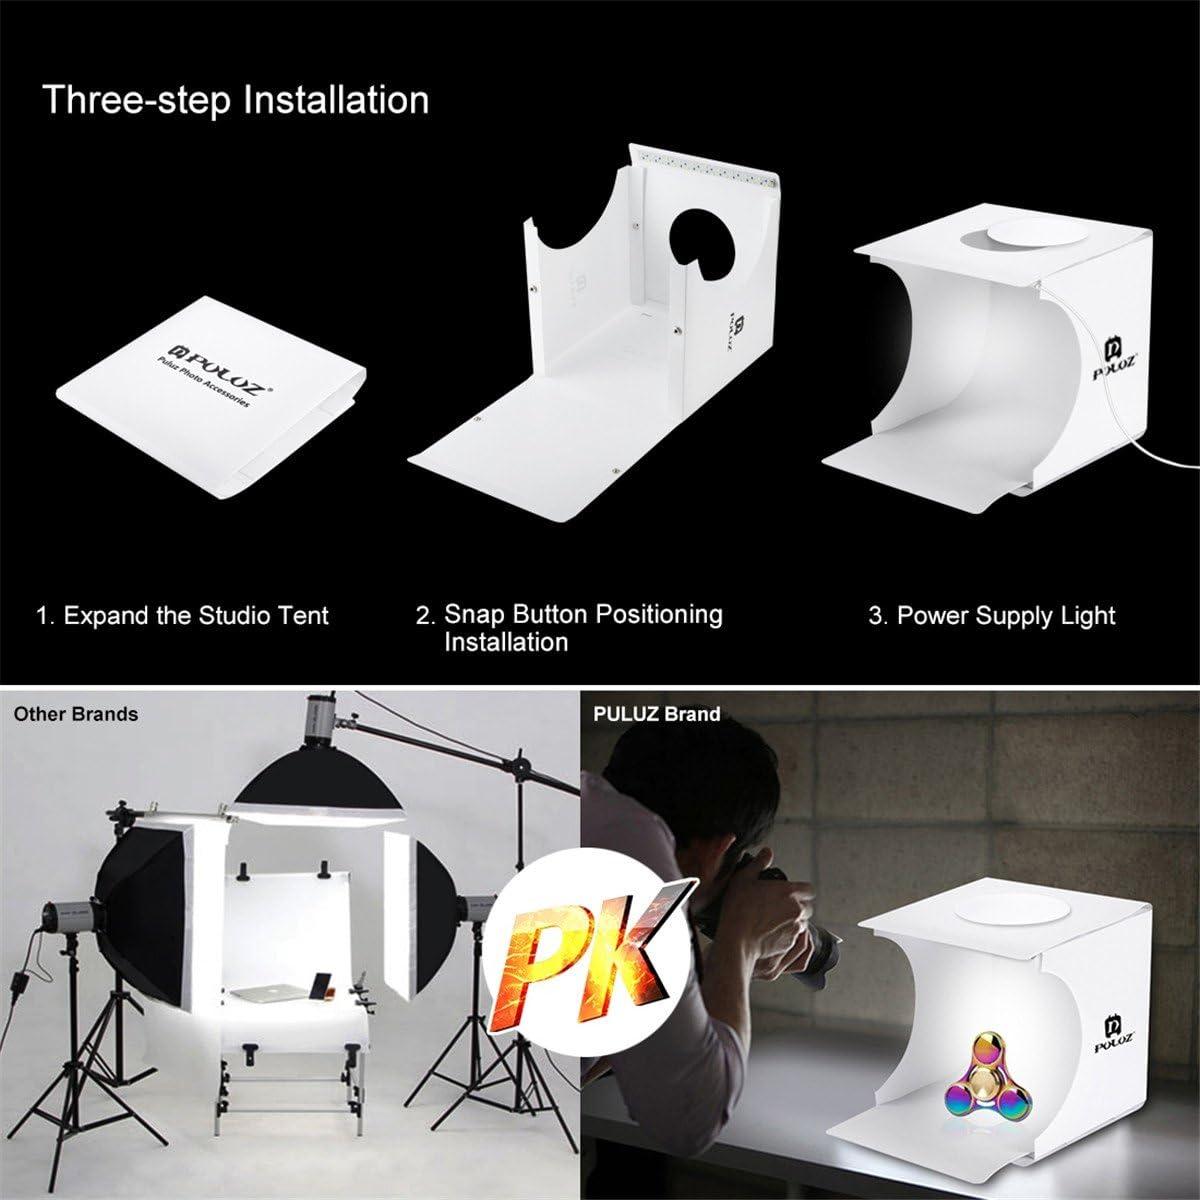 sfondo studio fotografico ripresa tenda piccola scatola chiara pieghevole portatile con 6/colori 20/x 20/cm Ledmomo photo studio tenda